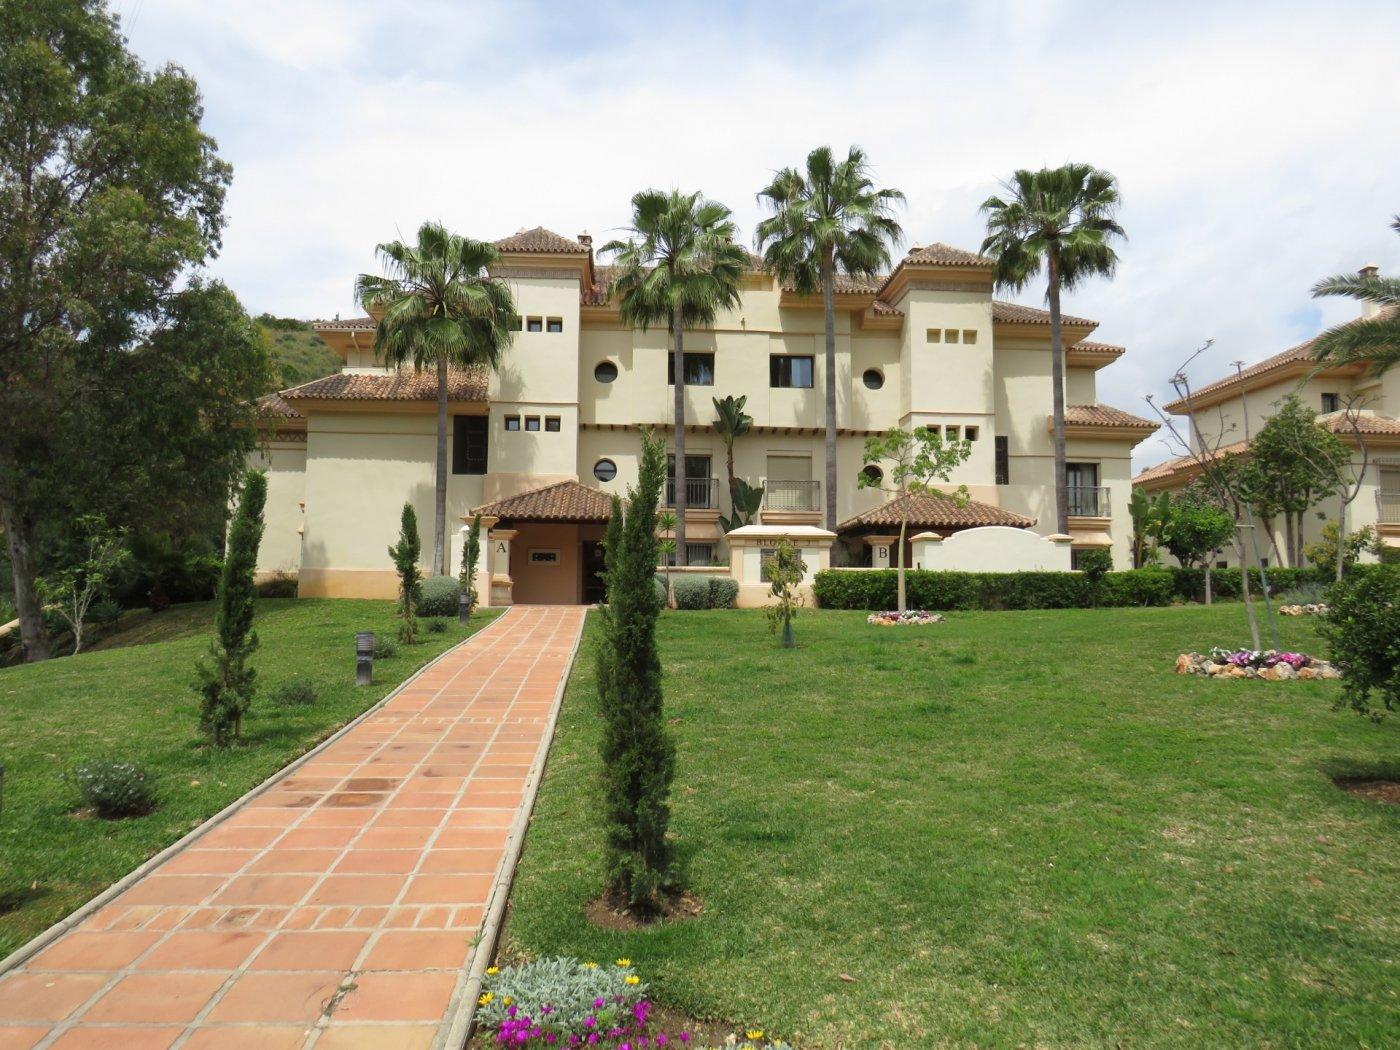 Apartment for sale in Rio real, Marbella